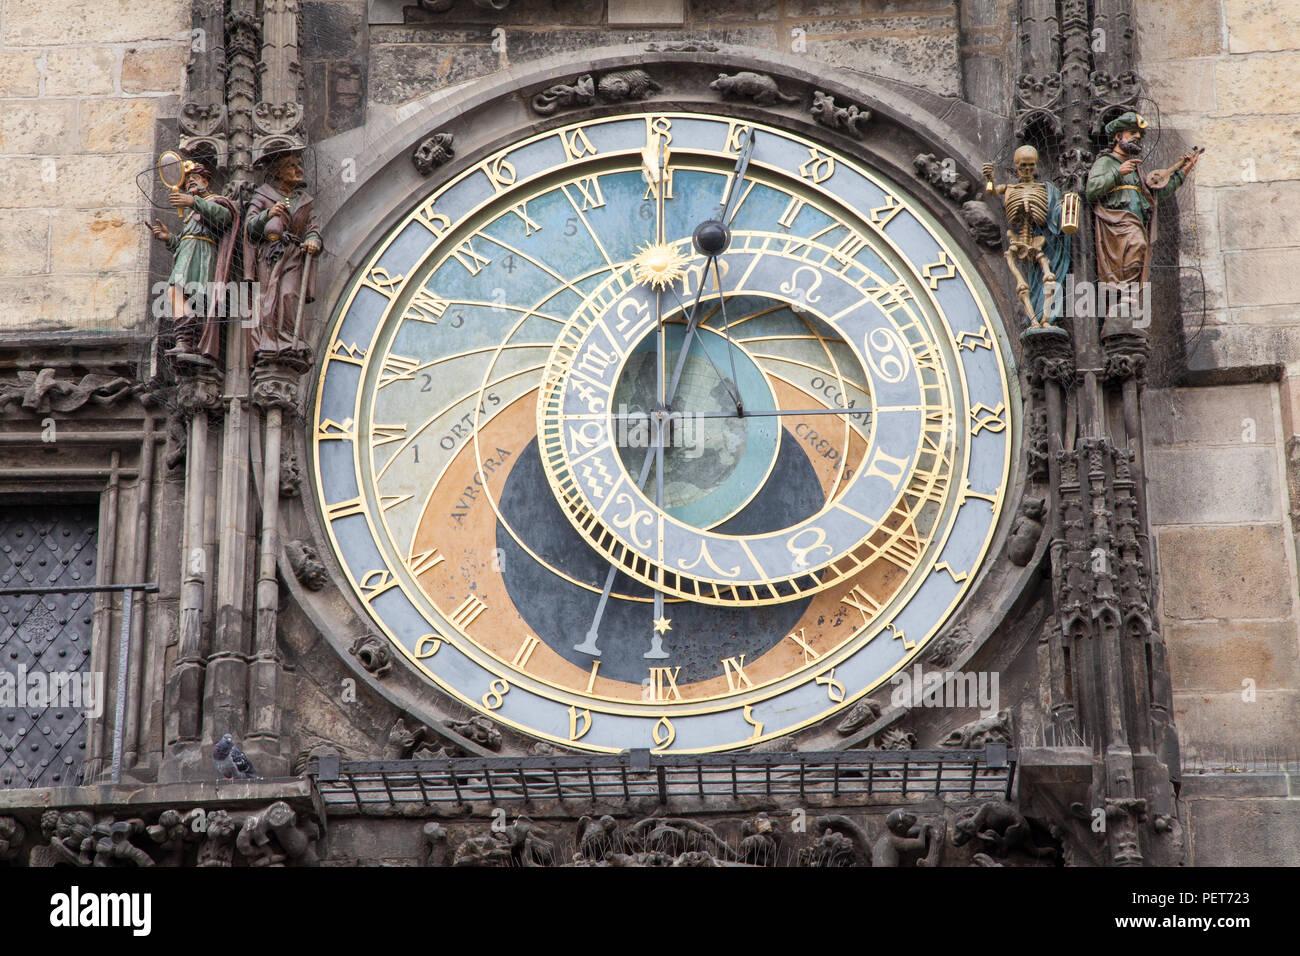 Astronomical clock in Prague, Czech Republic - Stock Image